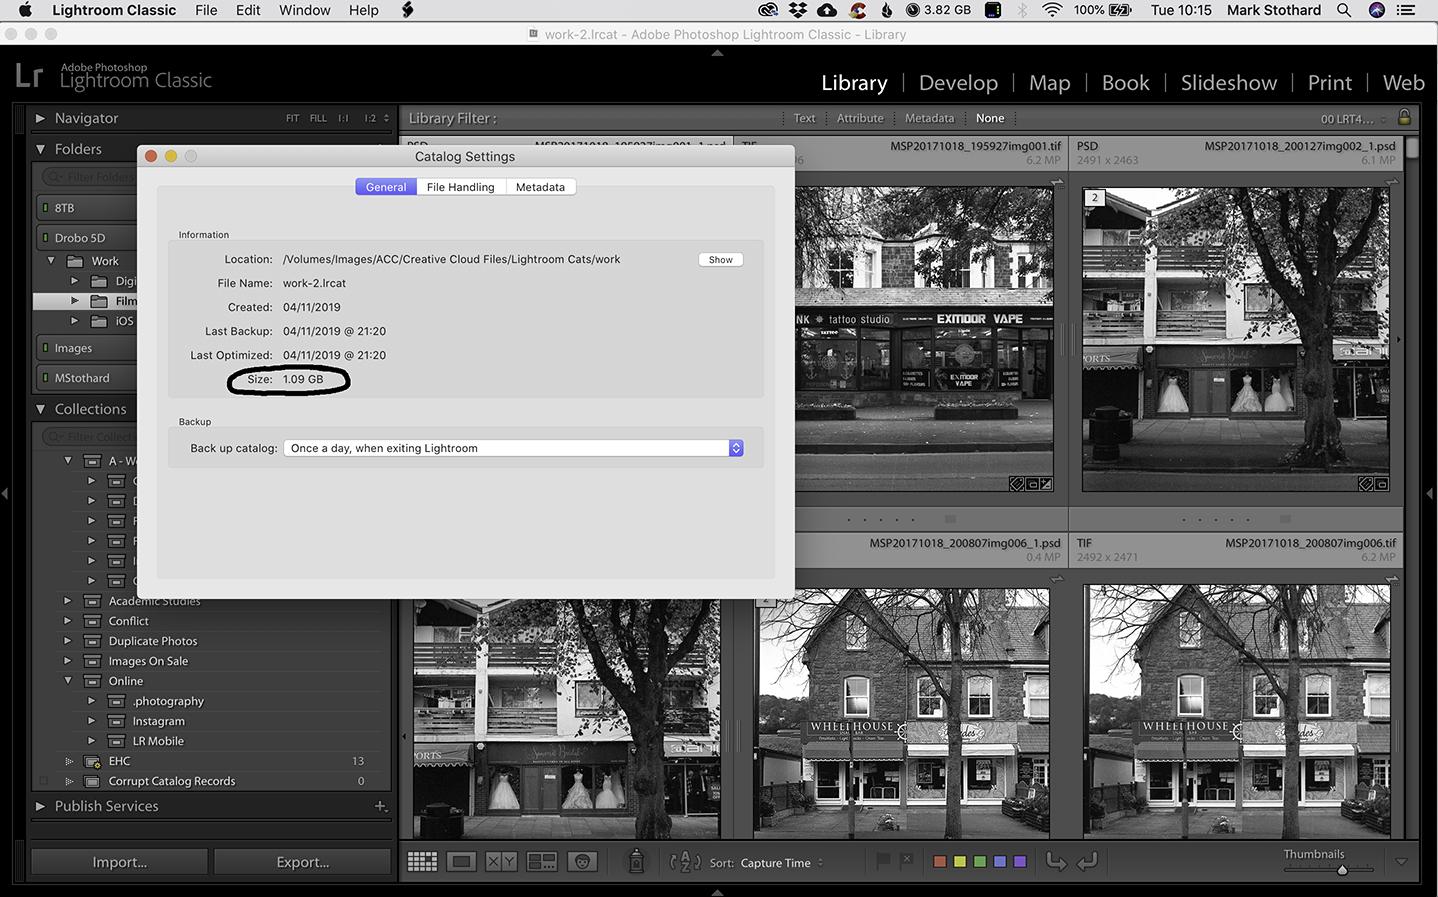 Screenshot 2019-11-05 10.15.17.png